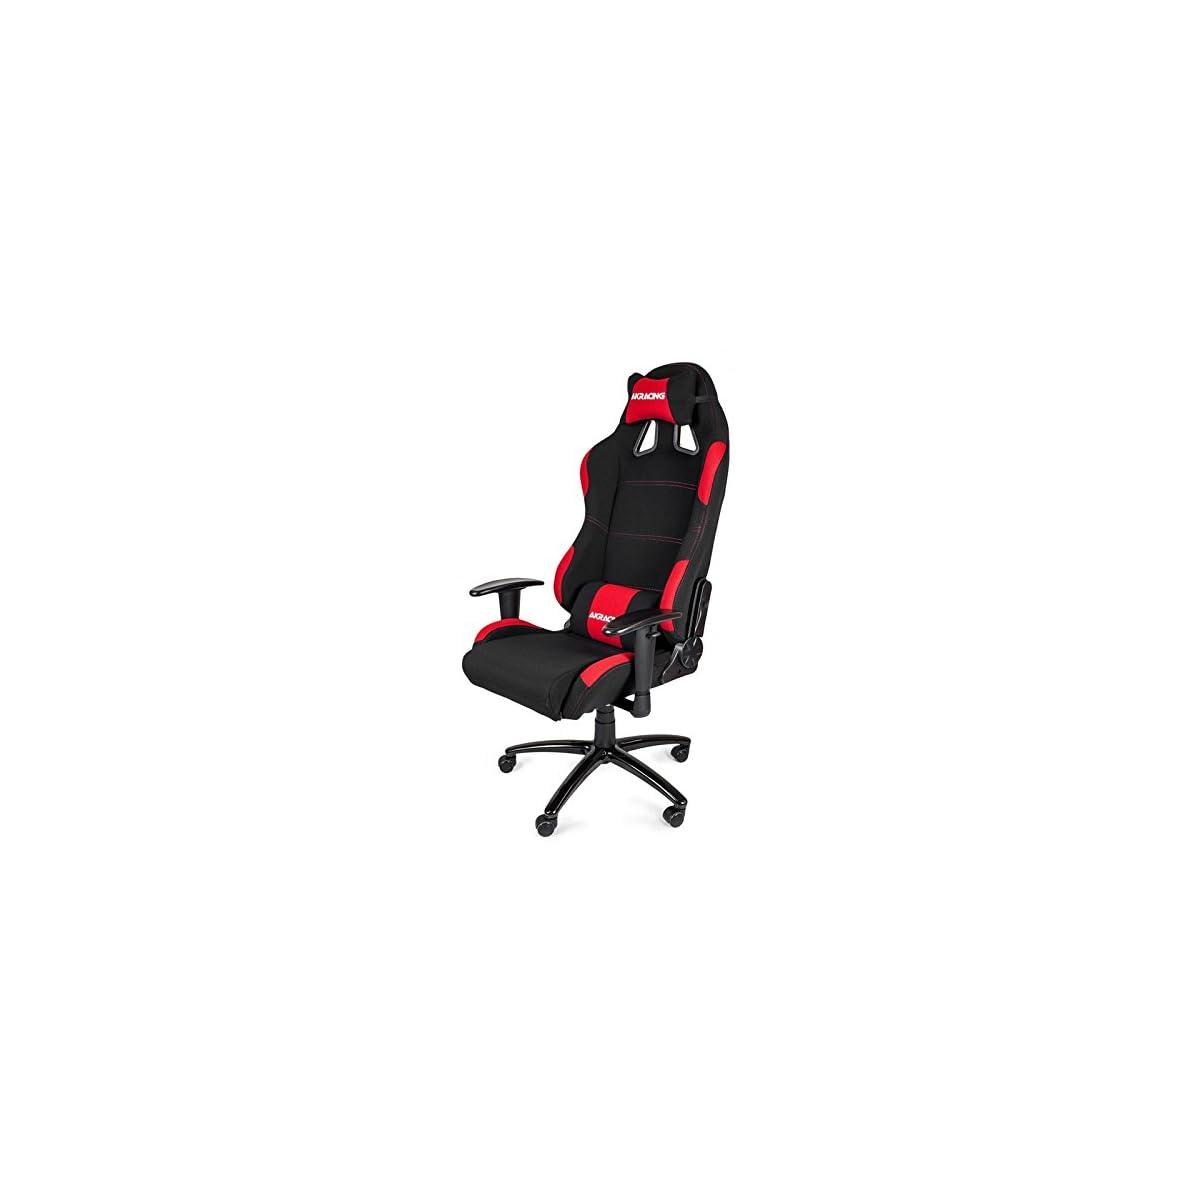 41 r5GE8xCL. SS1200  - AKRacing K7012 - AK-7012-BR - Silla Gaming, Color Negro/Rojo